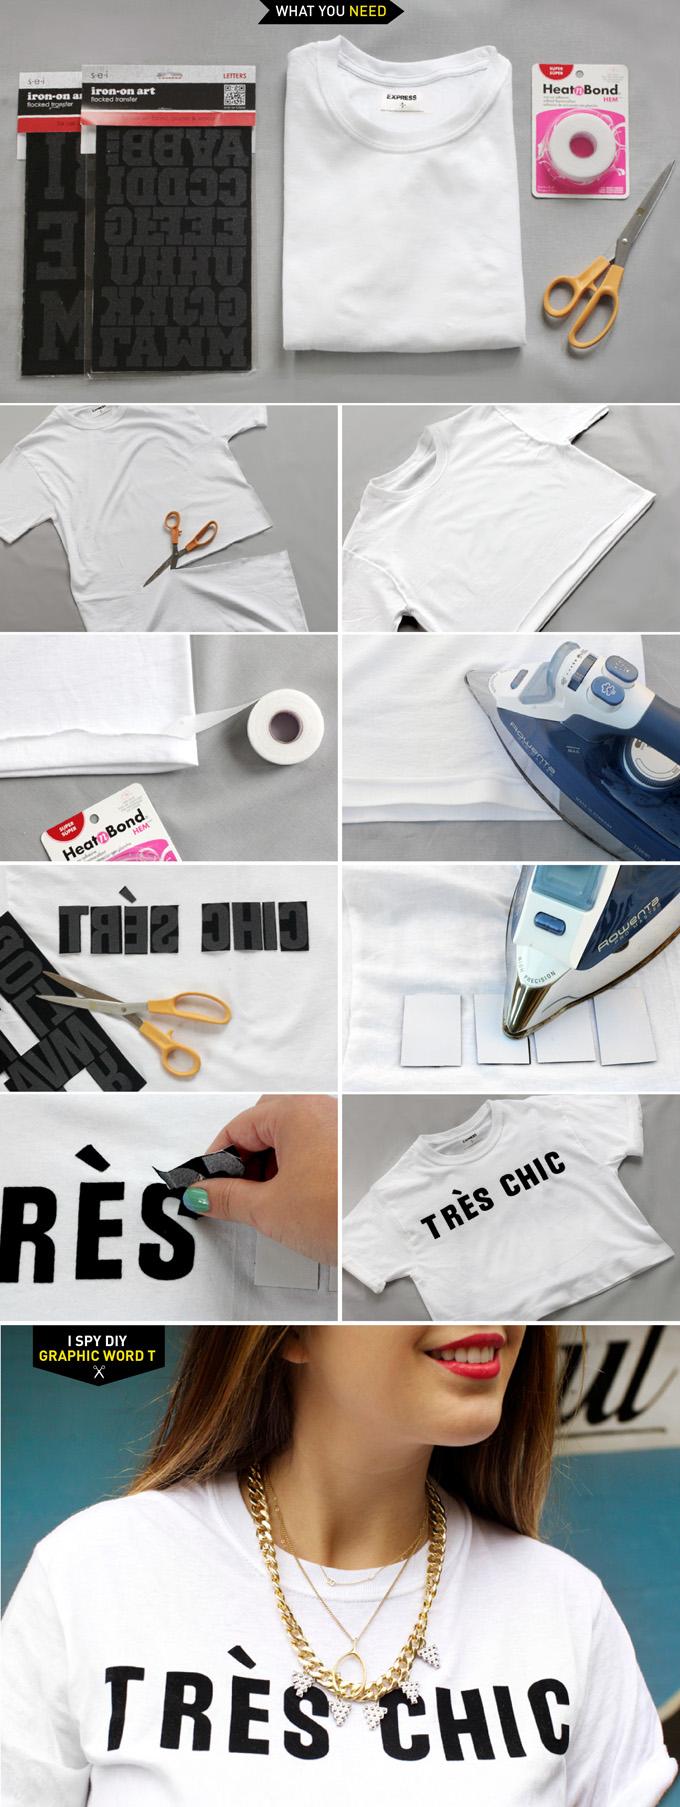 diy-clothes-41